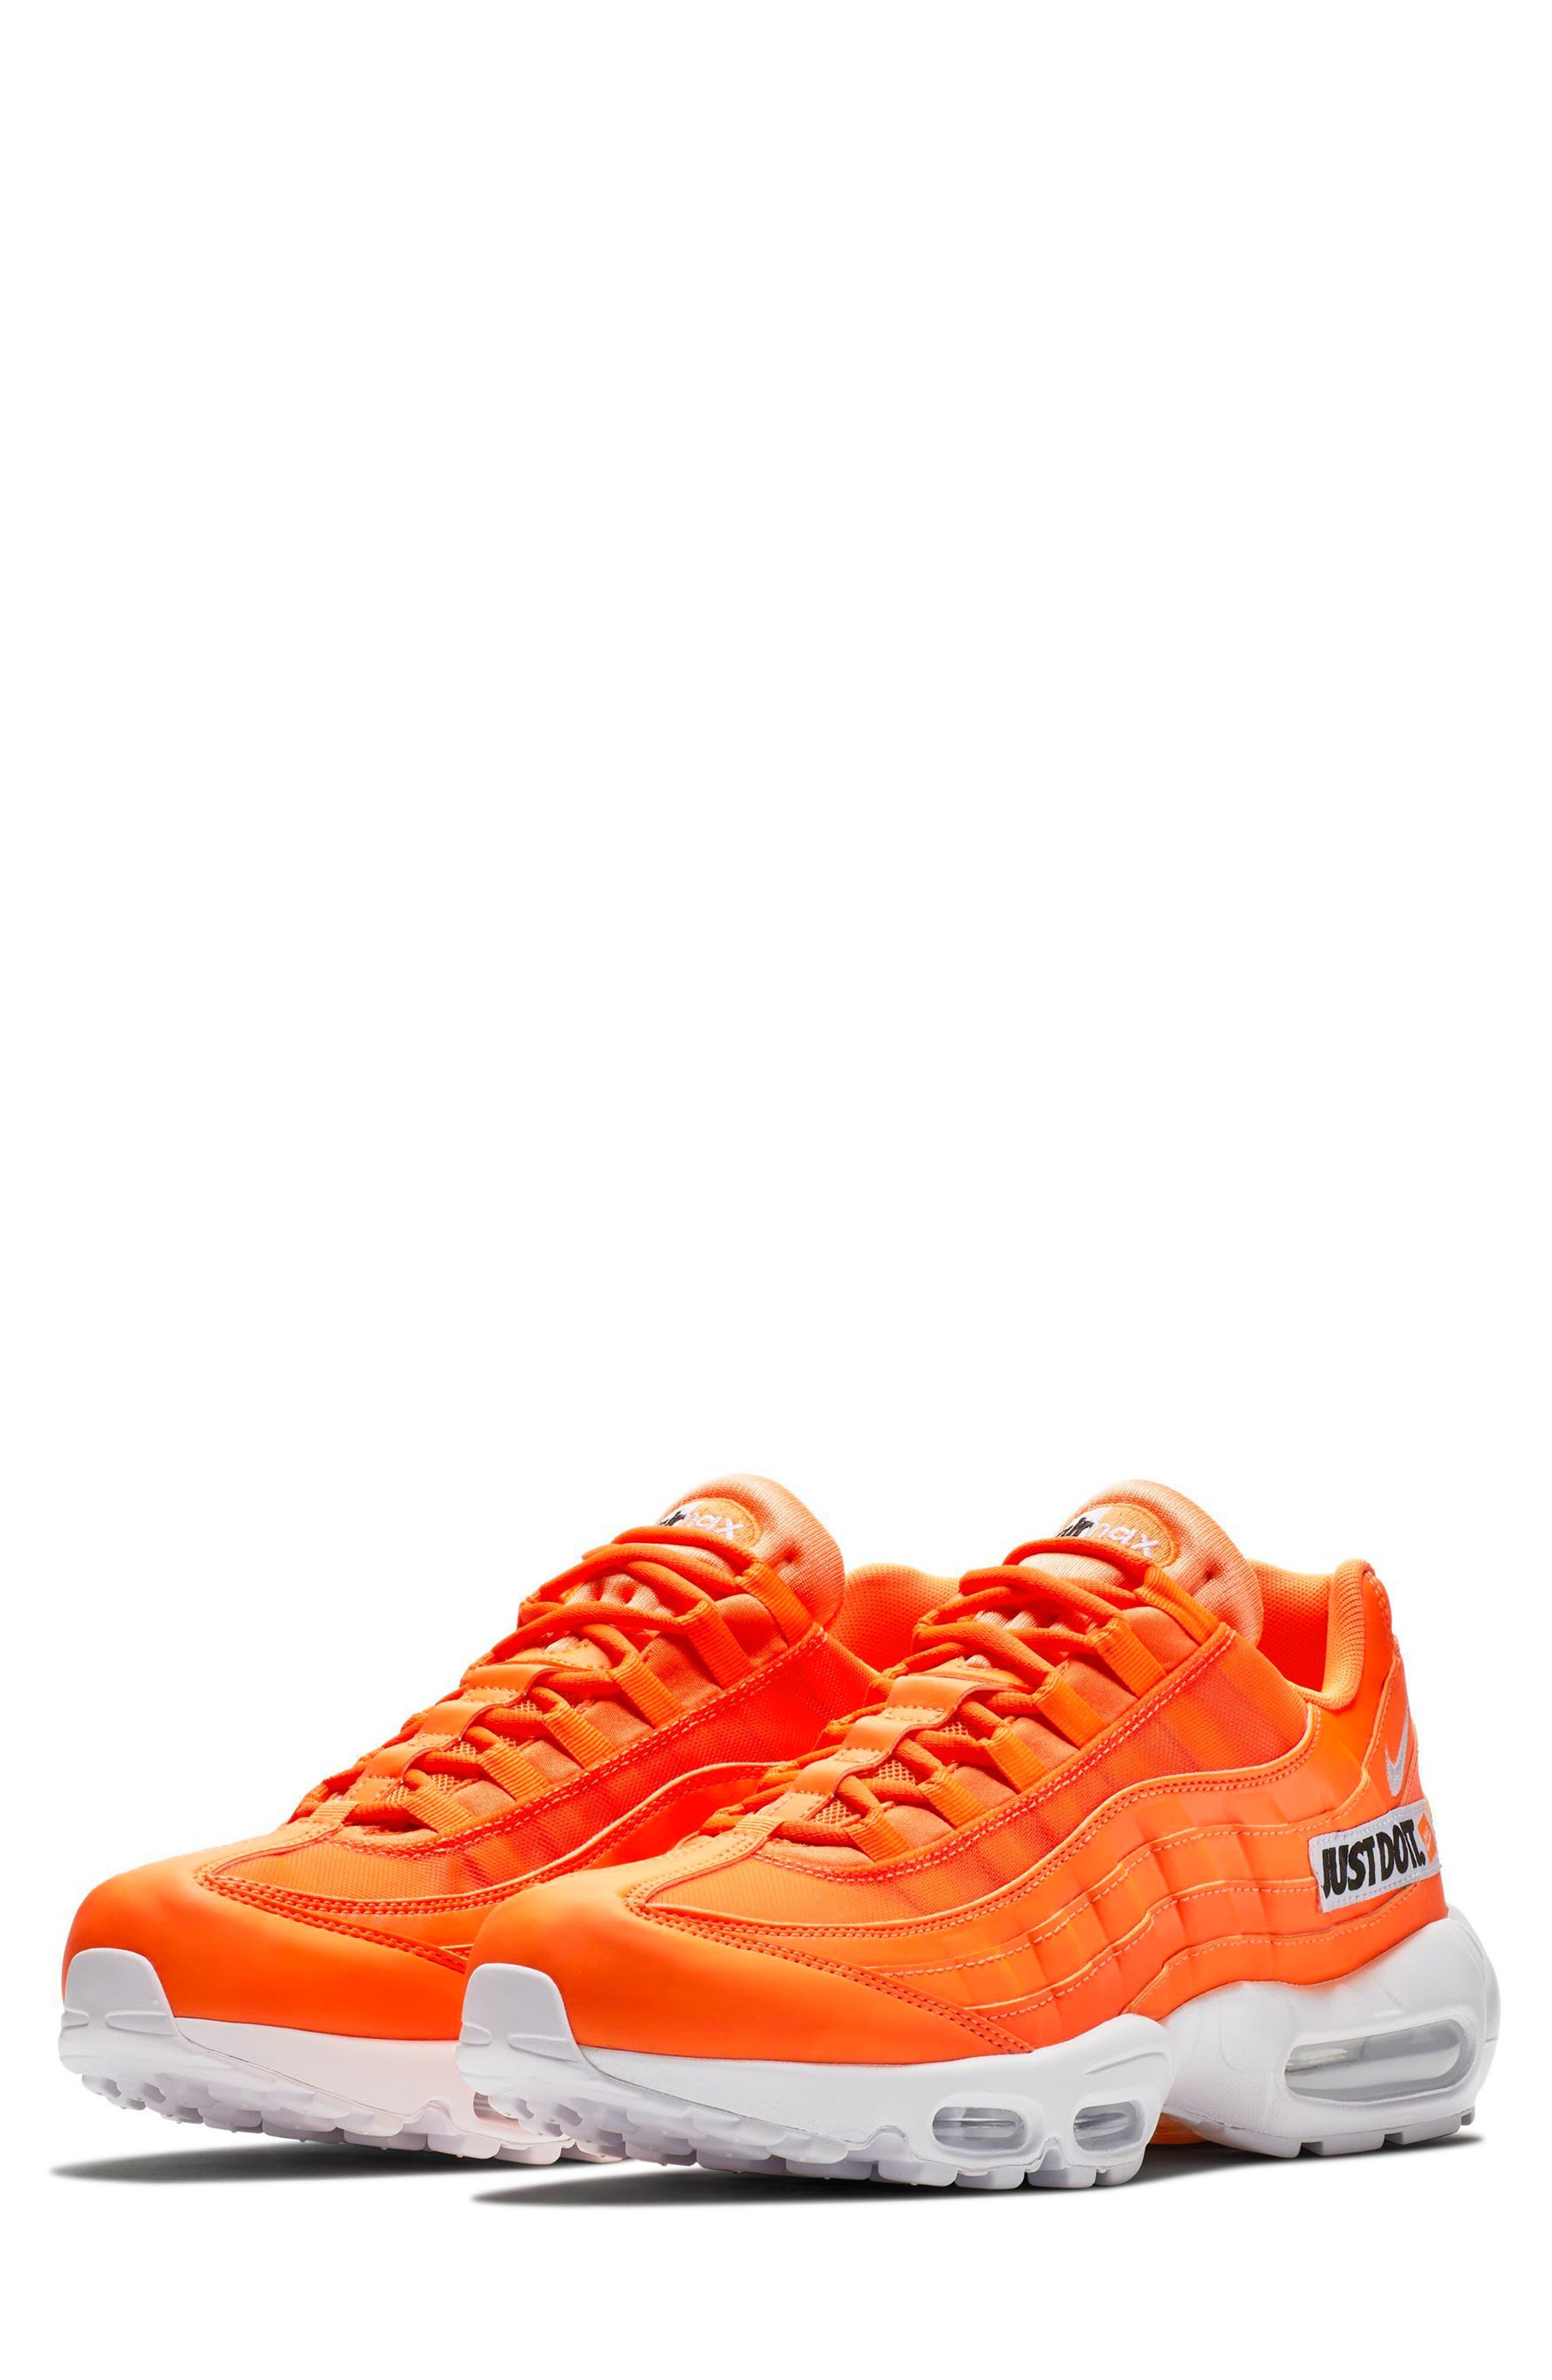 Air Max 95 SE Running Shoe,                         Main,                         color, ORANGE/ WHT-BLK